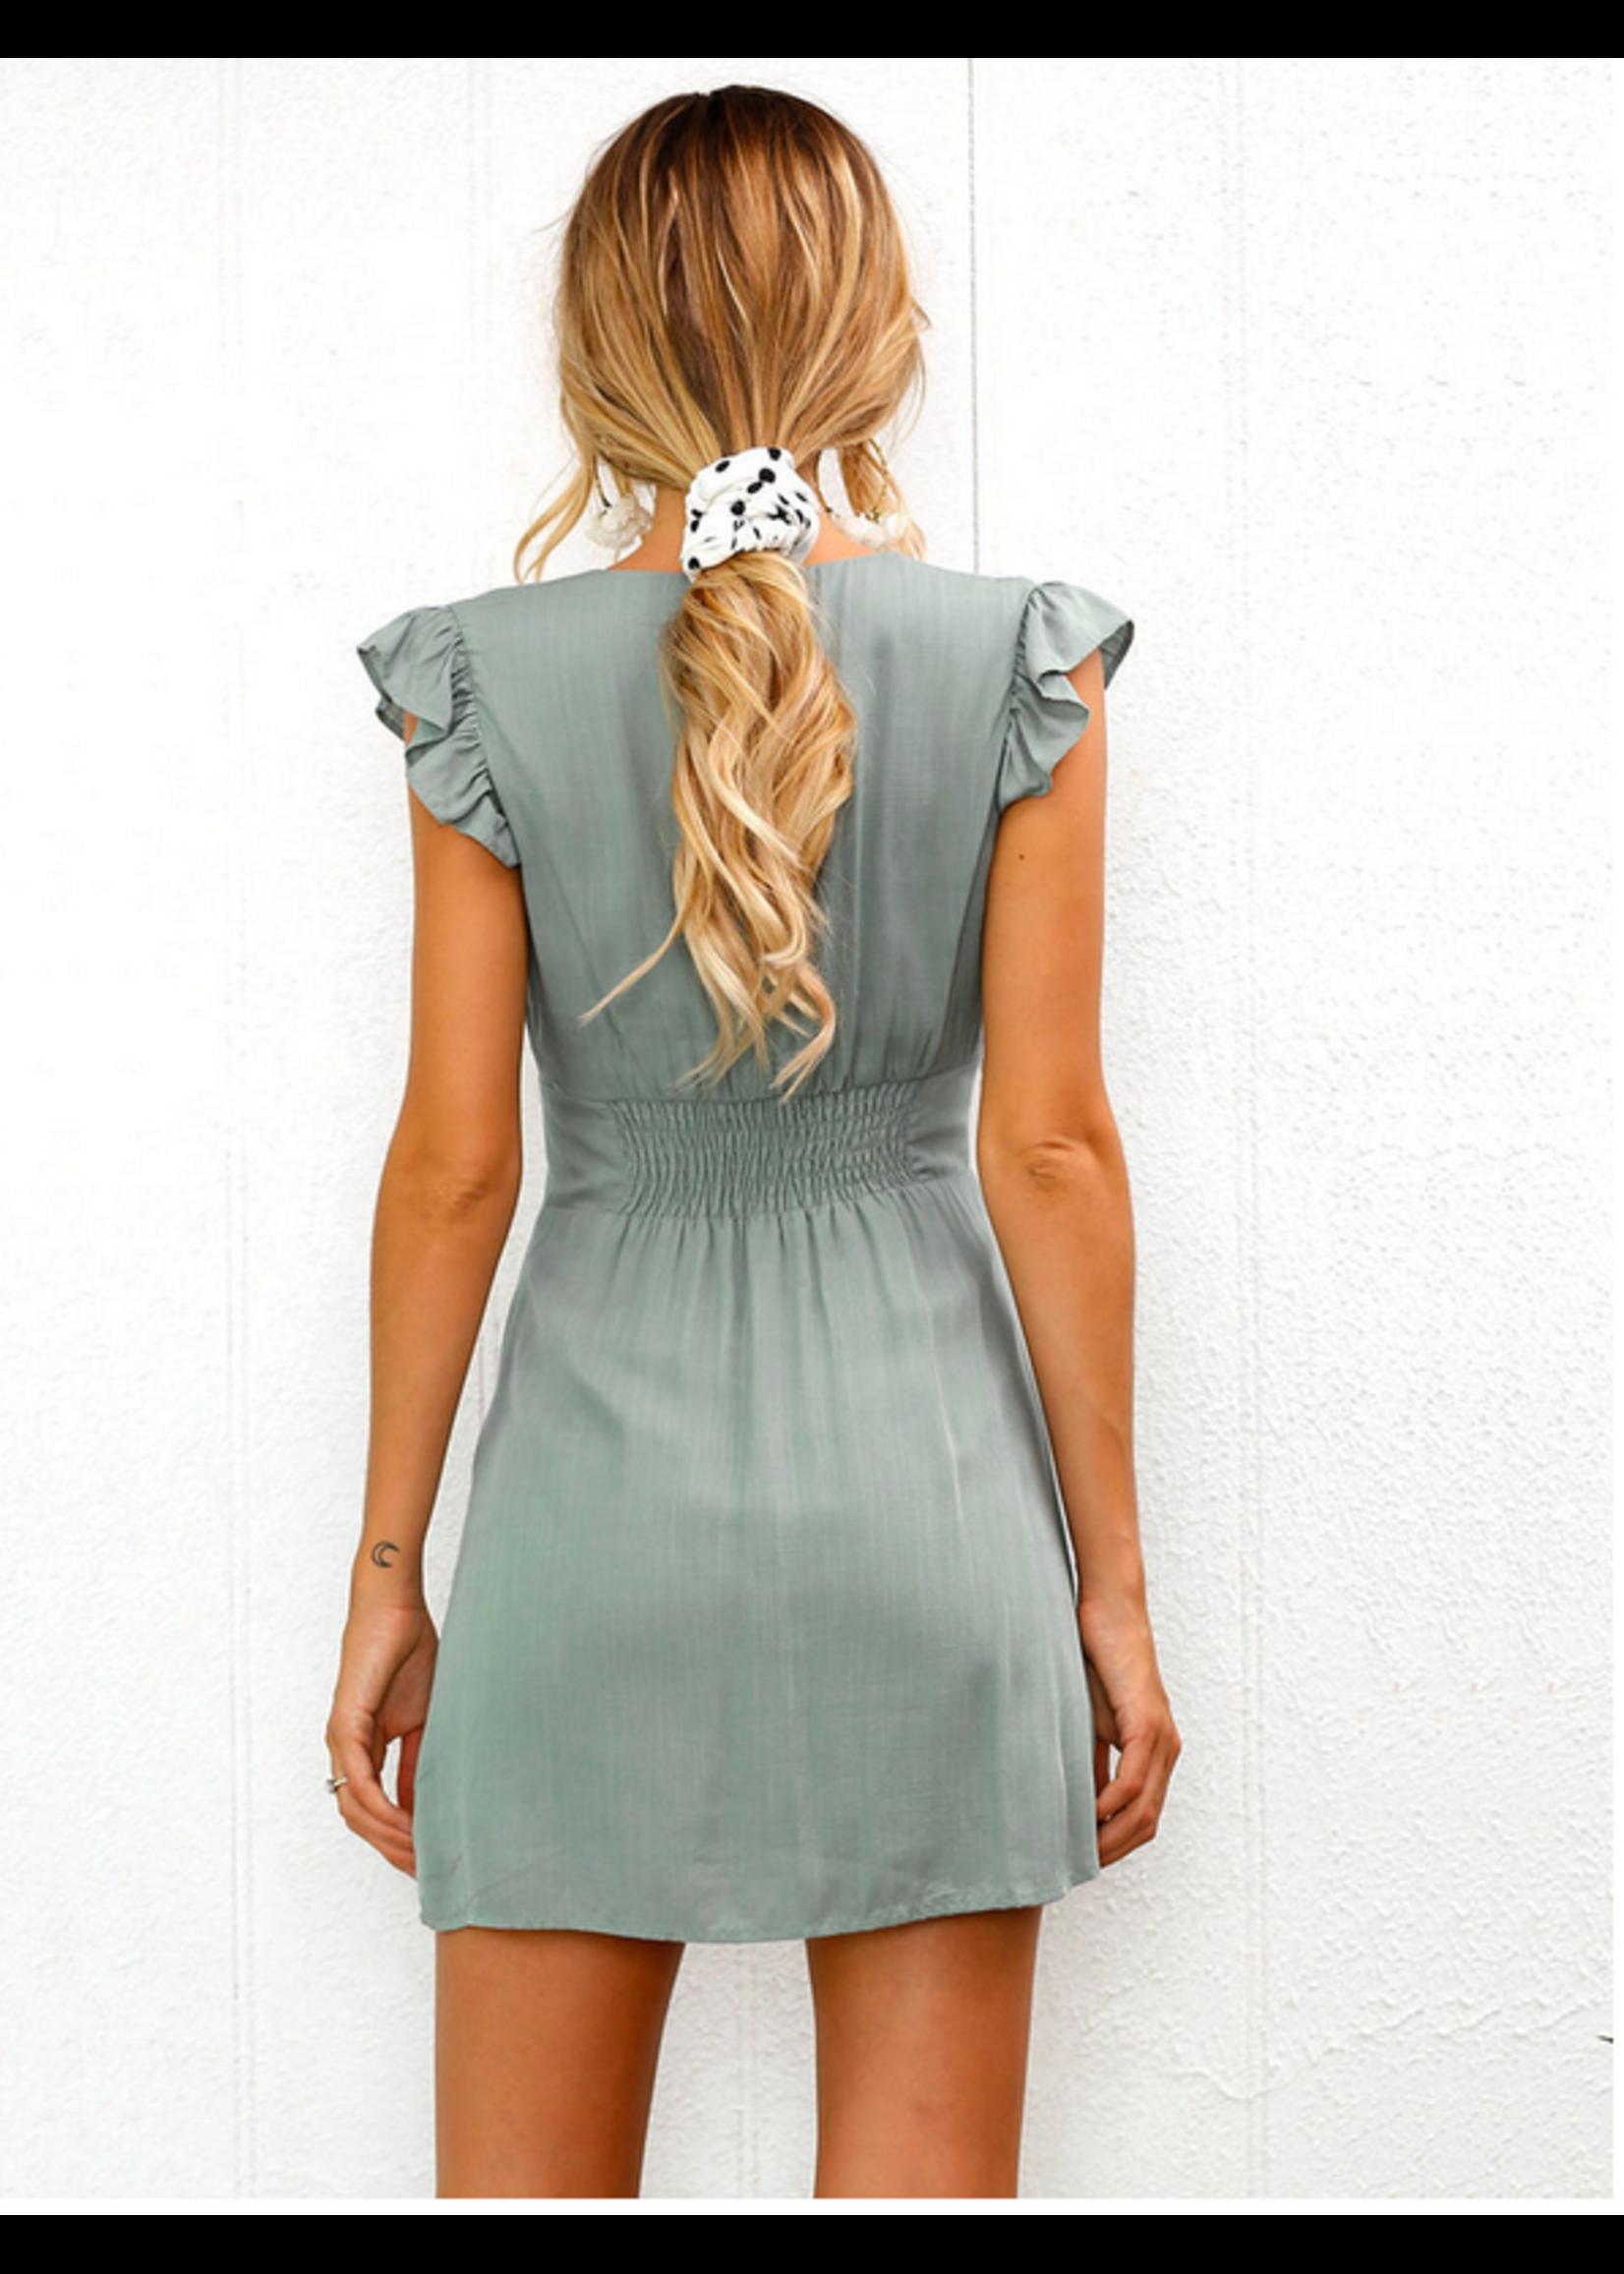 AEXPRESS Kenzie Summer Mini Dress Sage